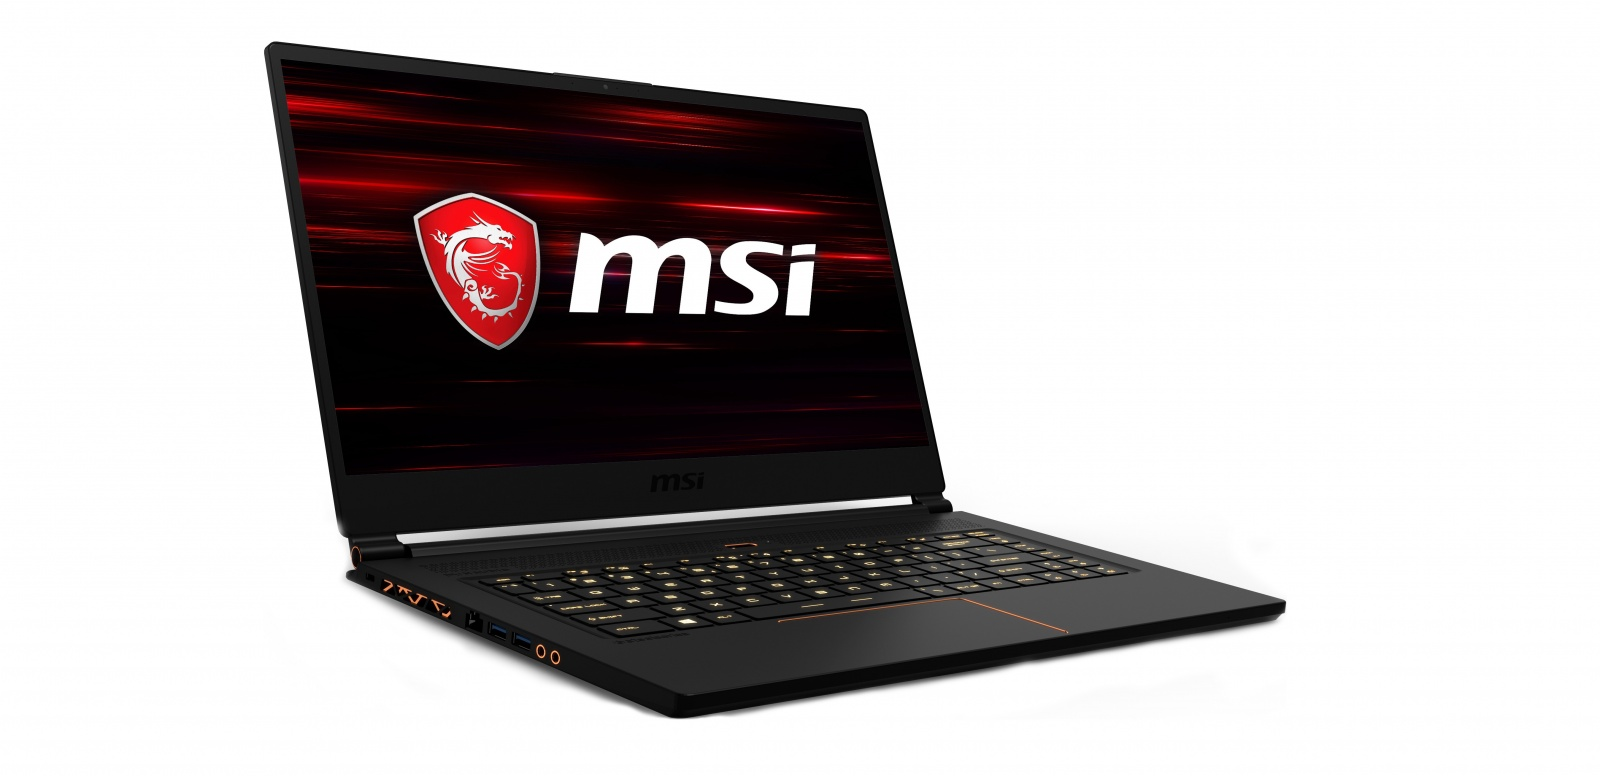 MSI GS65 STEALTH THIN лучше чем MSI GS63